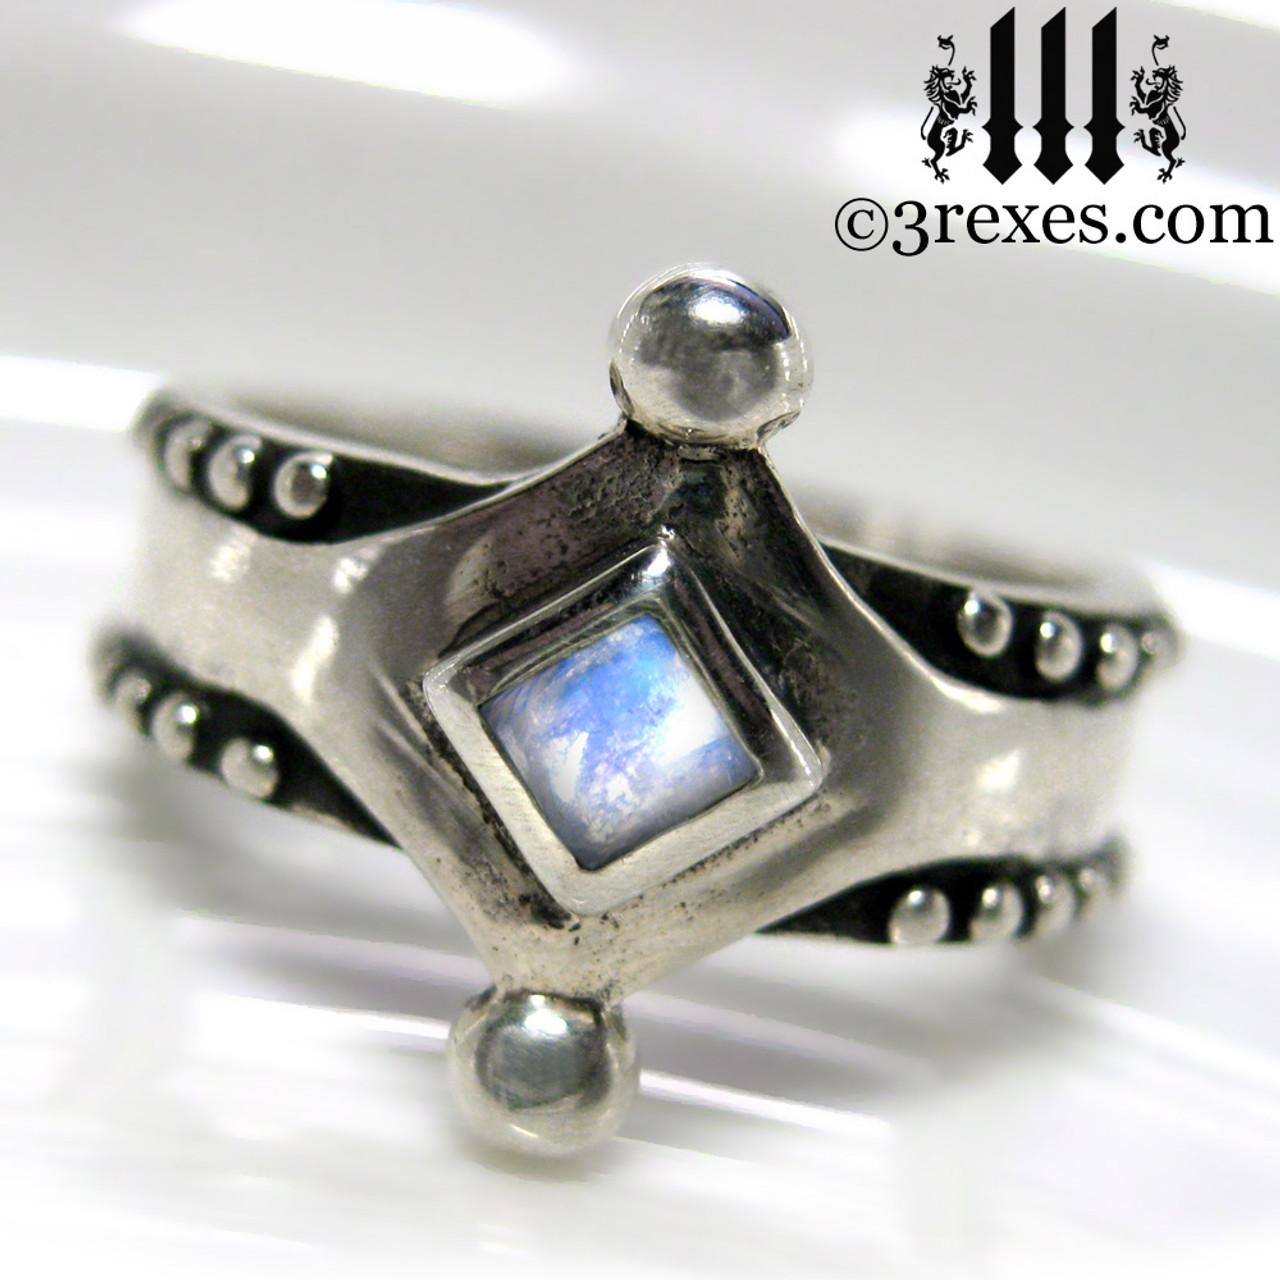 Enamour Studs 34013 Silver Wedding Rings Argos Silver Wedding Rings Mens Medieval Silver Ring Magic Moonstone Wedding Ring wedding rings Silver Wedding Rings